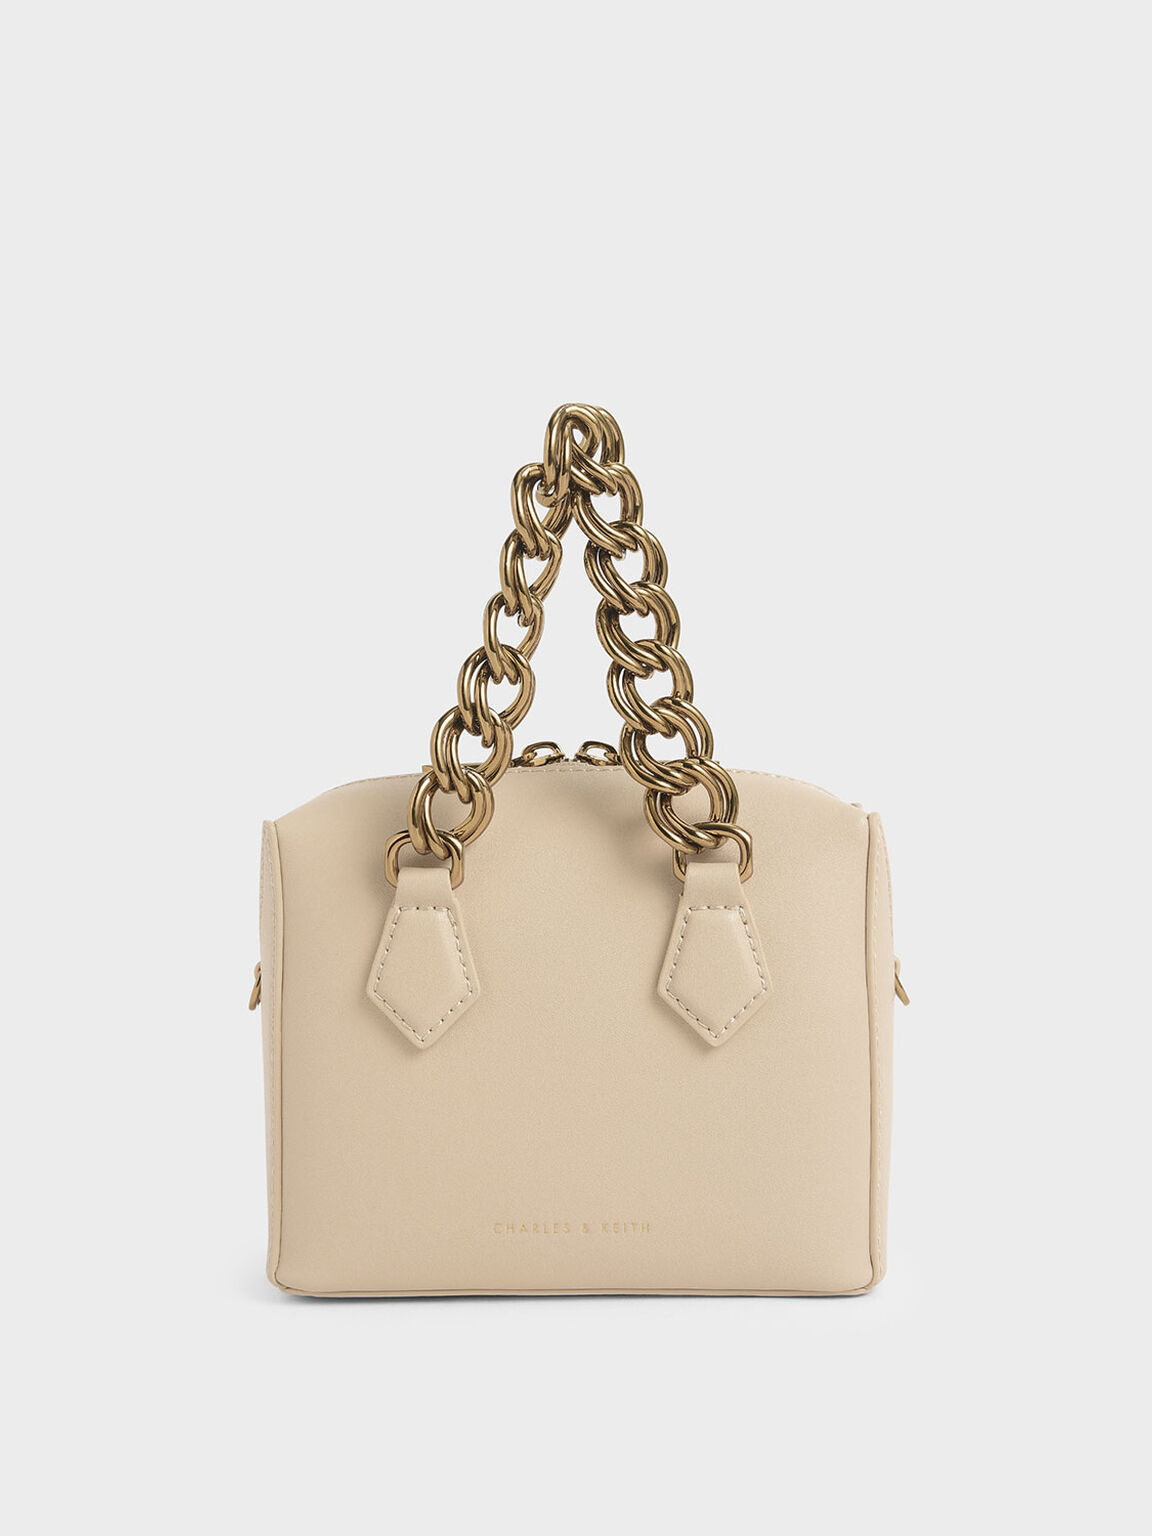 Square Chunky Chain Handle Crossbody Bag, Beige, hi-res